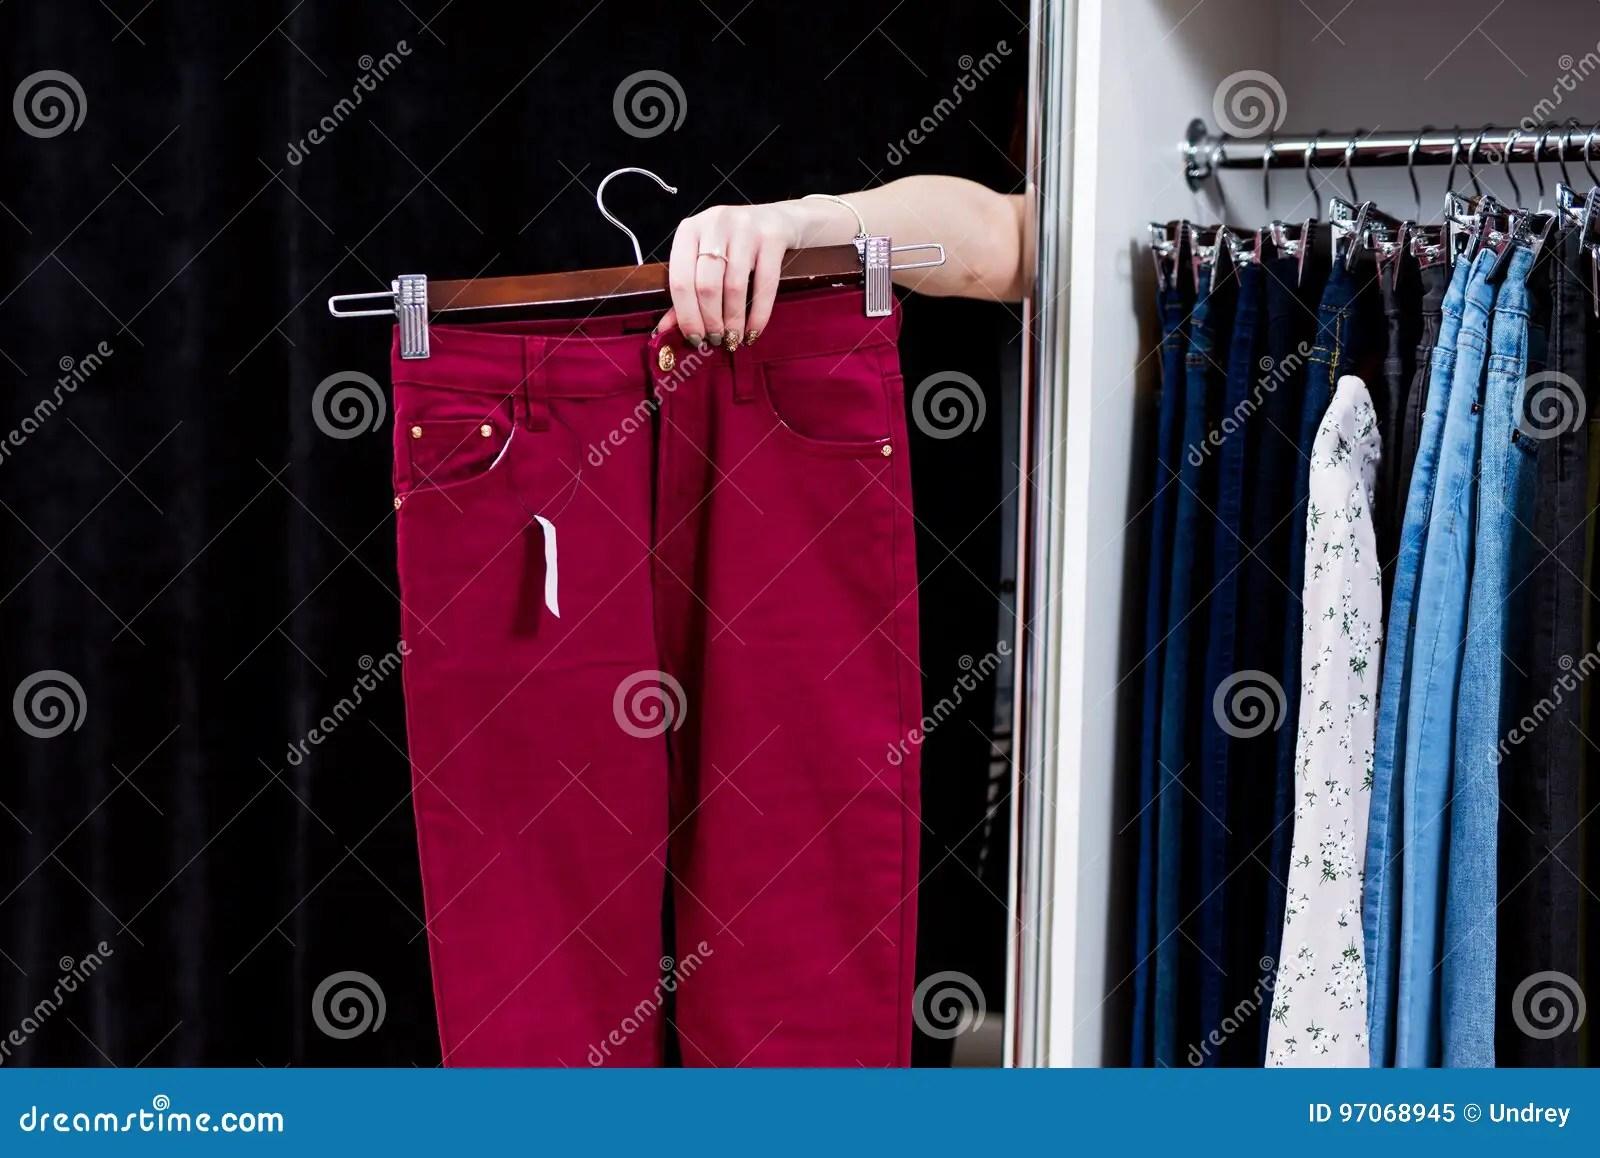 kitchen aid professional fifth wheel with outdoor 尝试在提供援助从一个试装间的服装店的裤子的妇女手拿着长裤库存图片 尝试在提供援助从一个试装间的服装店的裤子的妇女